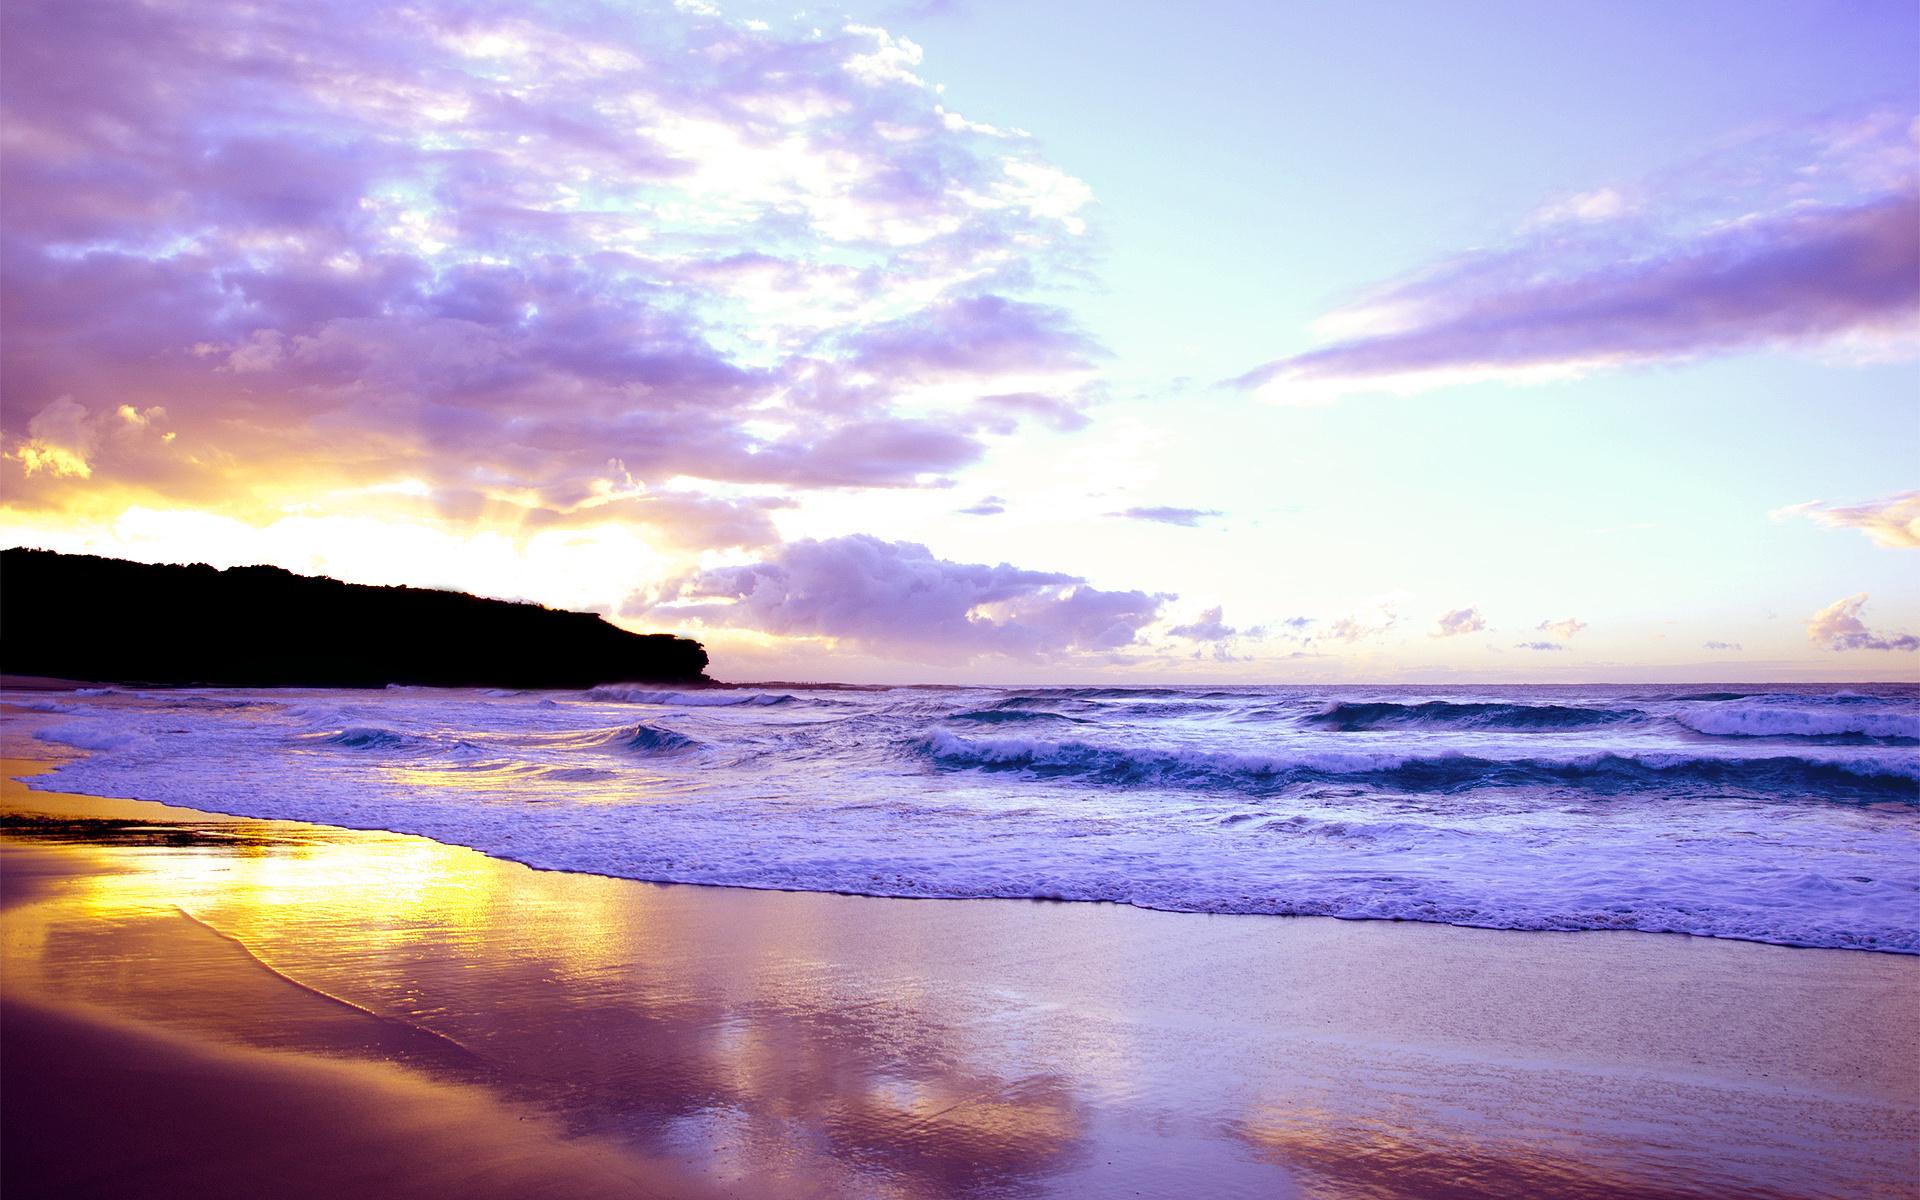 Landscape Sea Sunset Waves Beach Sky Beautiful Reflection Wallpaper